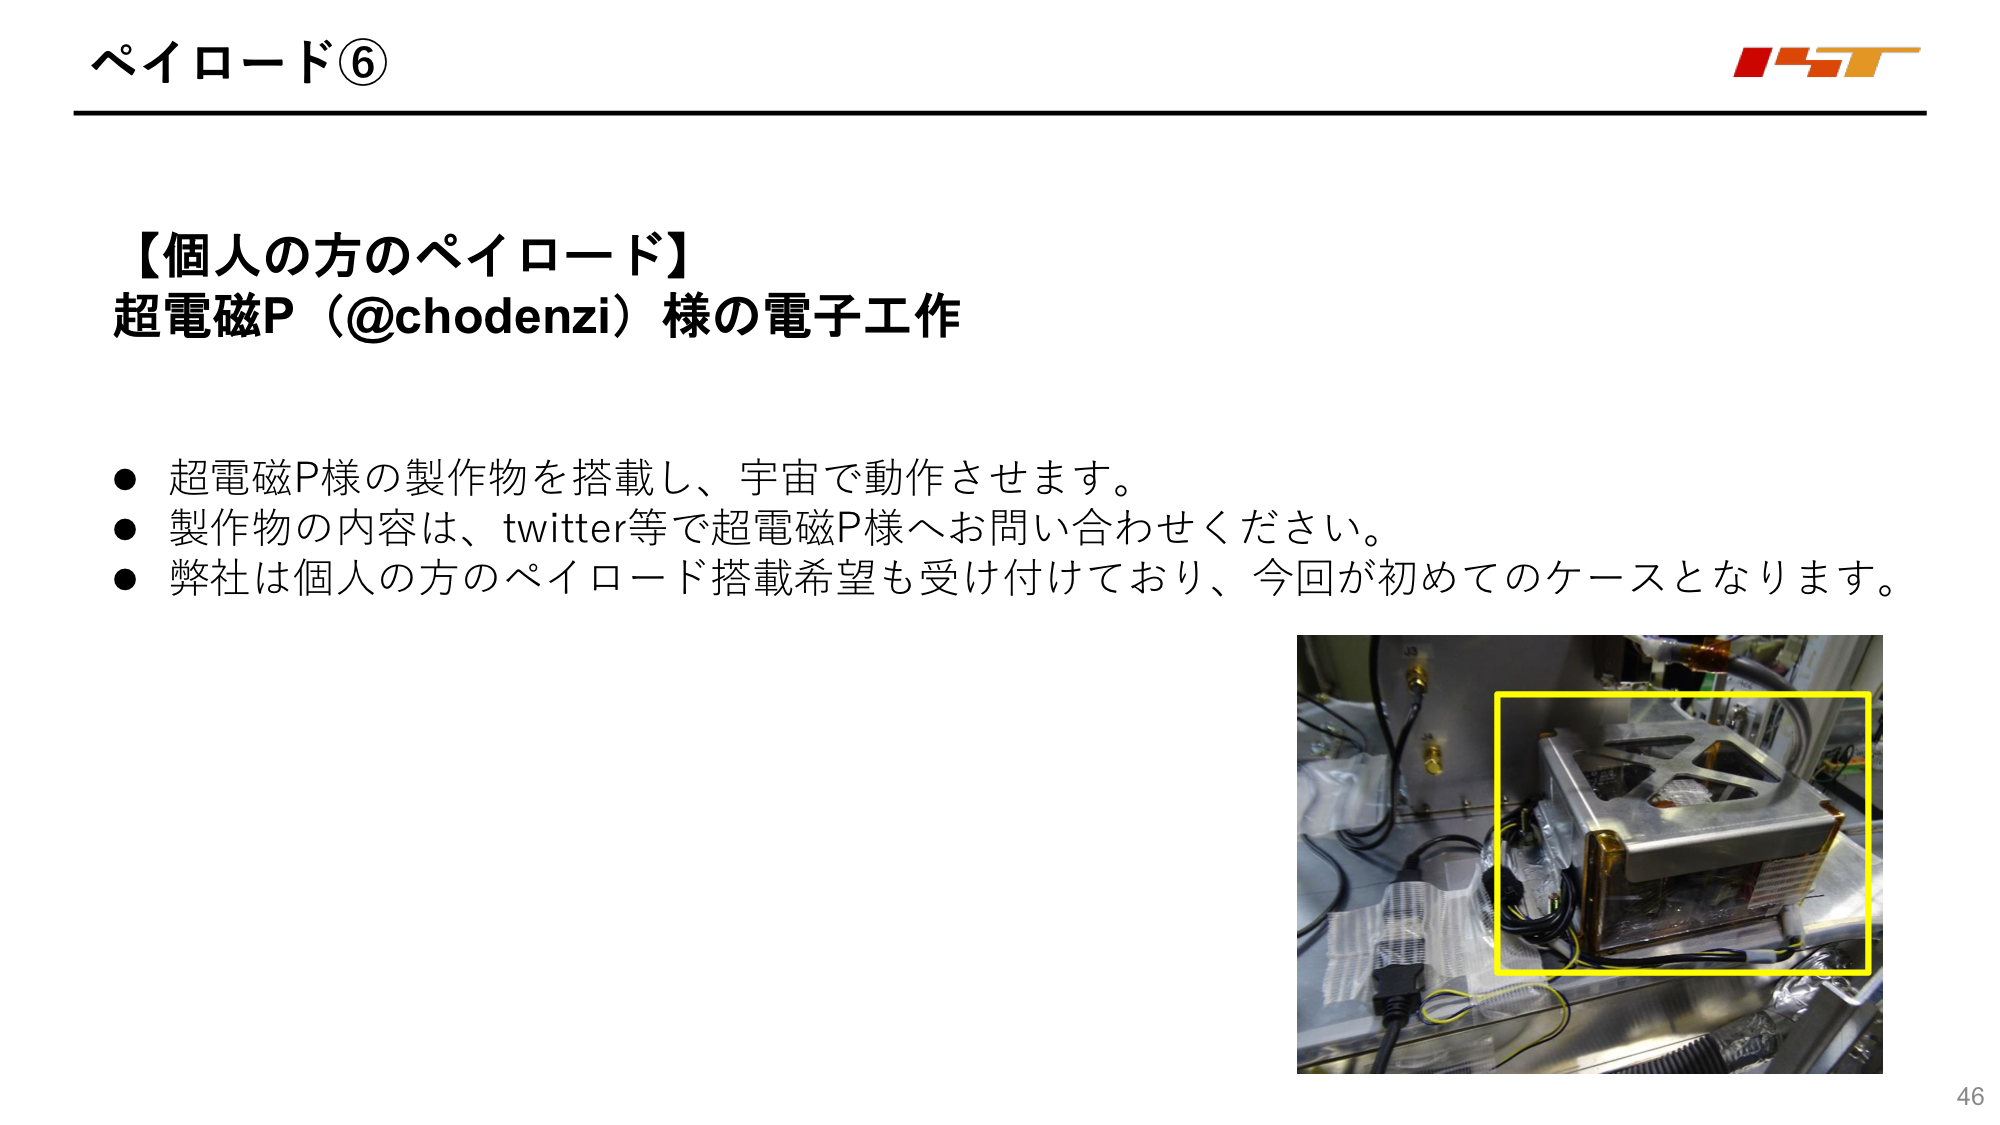 f:id:Imamura:20200603233209p:plain